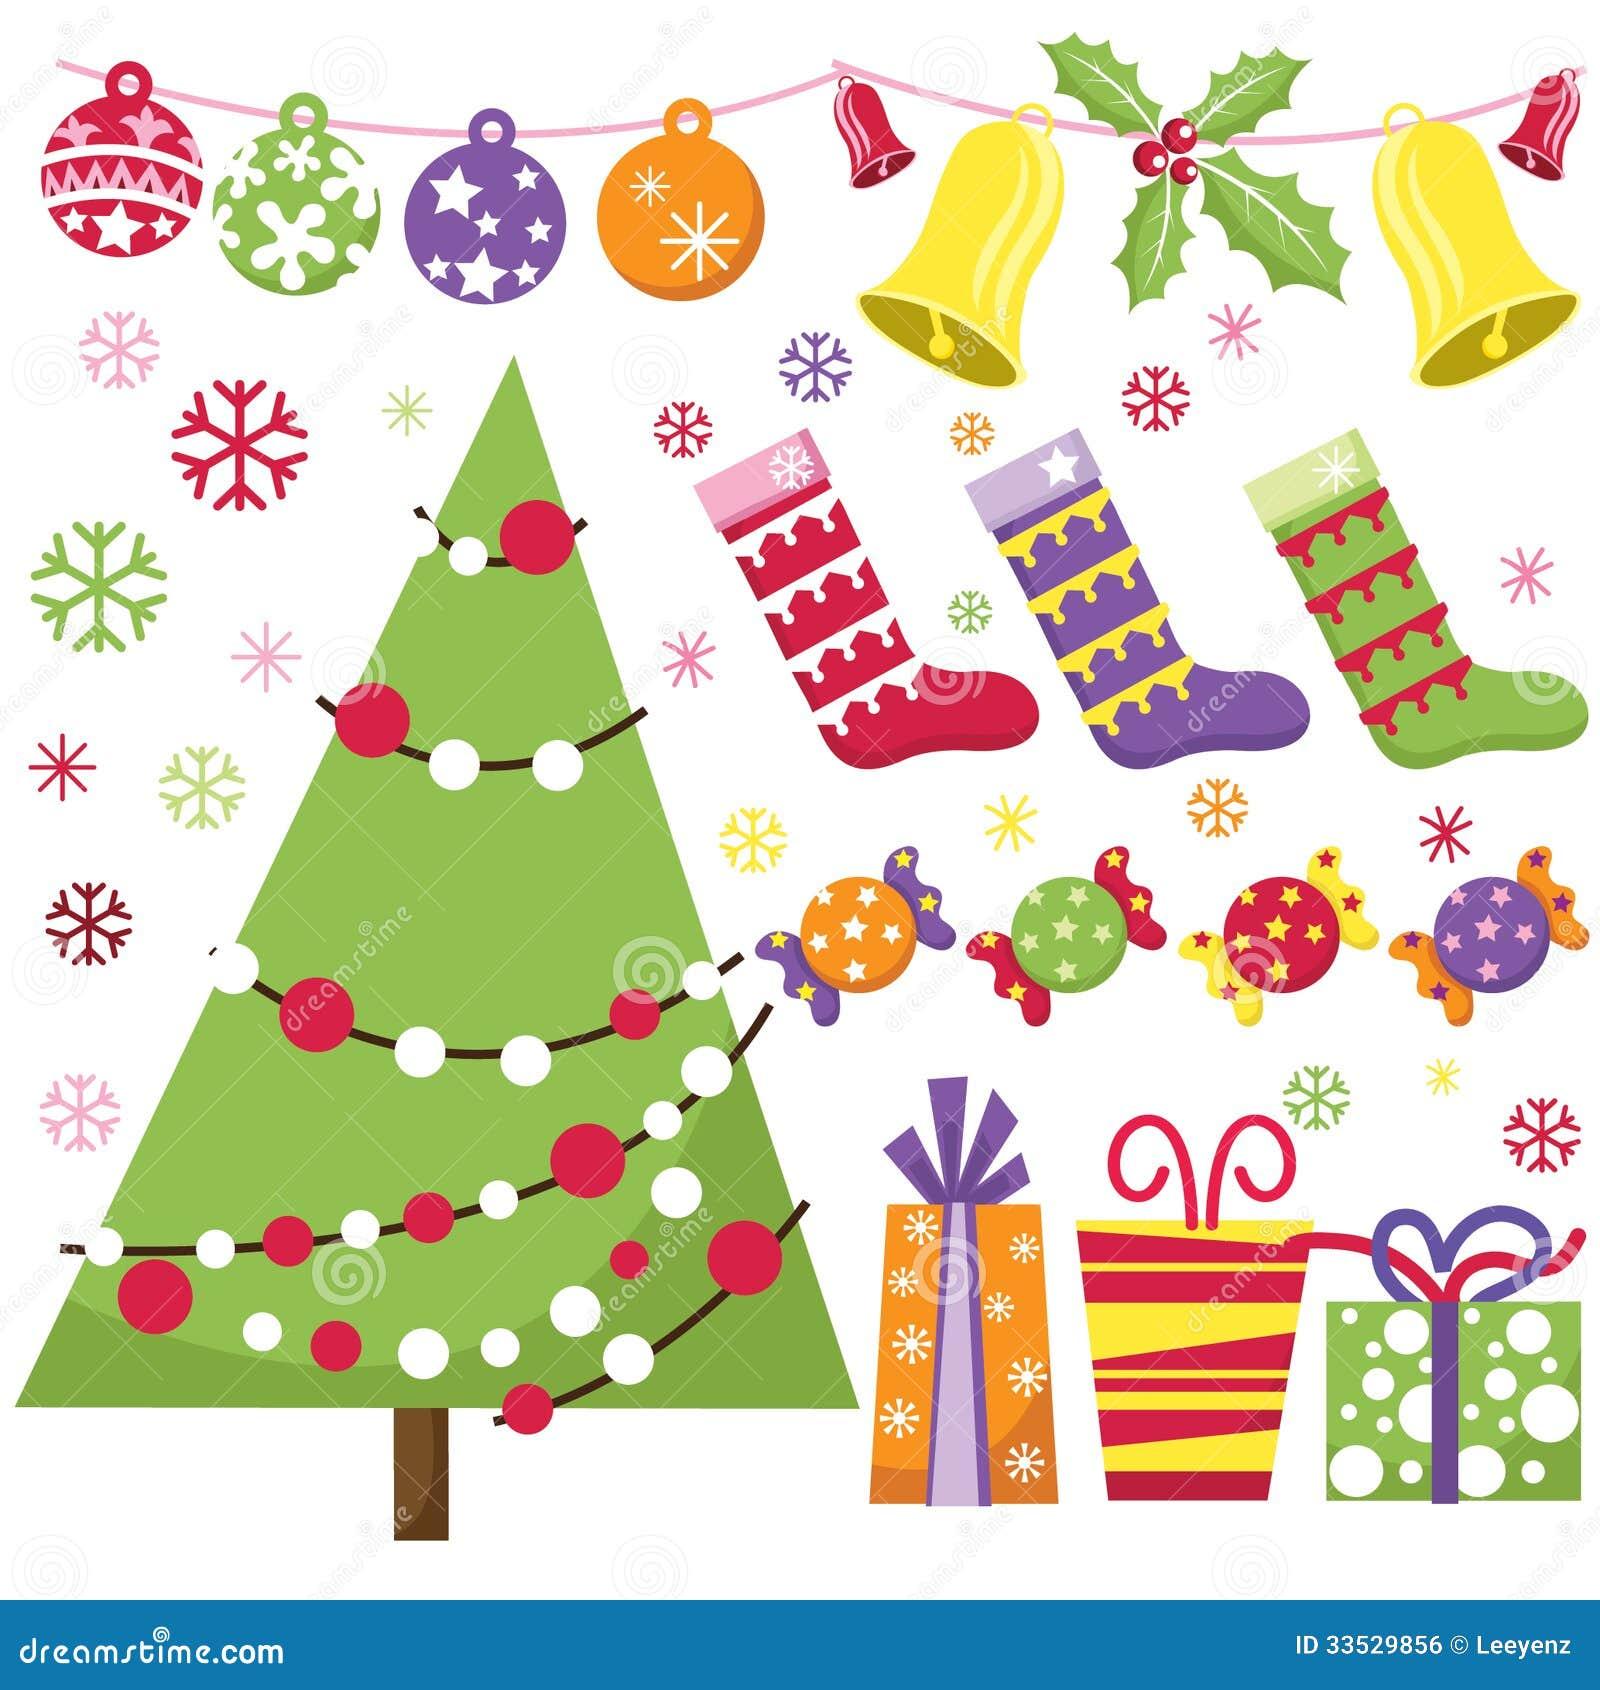 Christmas Tree Decoration Elements: Retro Christmas Set Stock Vector. Image Of Design, Shape